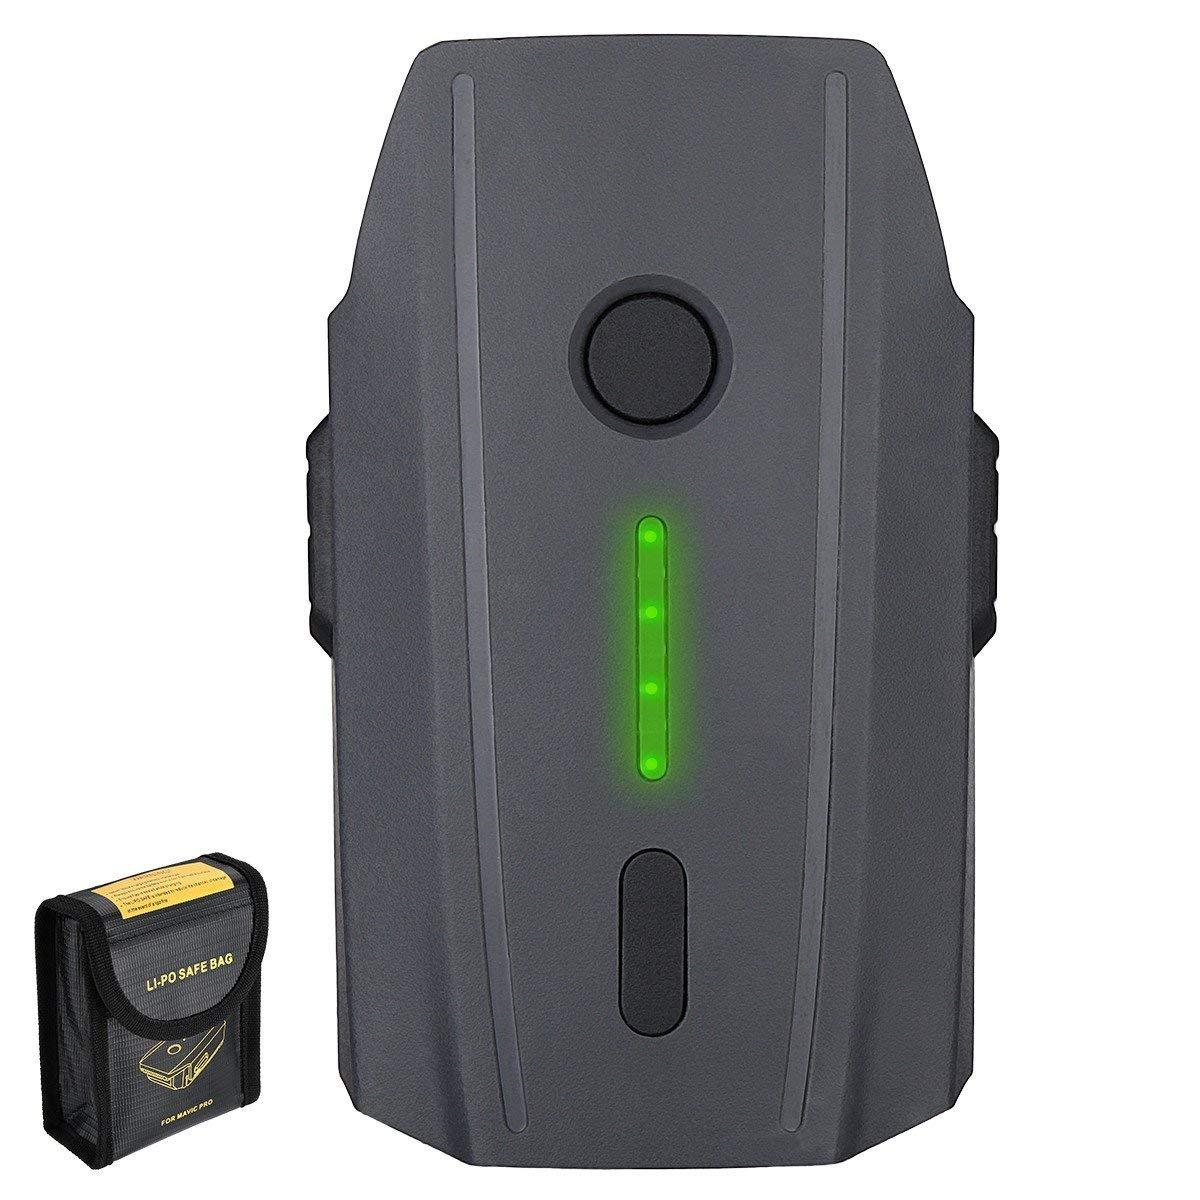 Mavic Pro Battery, Powerextra 11.4V 3830 mAh LiPo Intelligent Flight Battery + Battery Safe Bag Replacement for DJI Mavic Pro & Platinum & Alpine White Drone (Not Fit for Mavic 2)